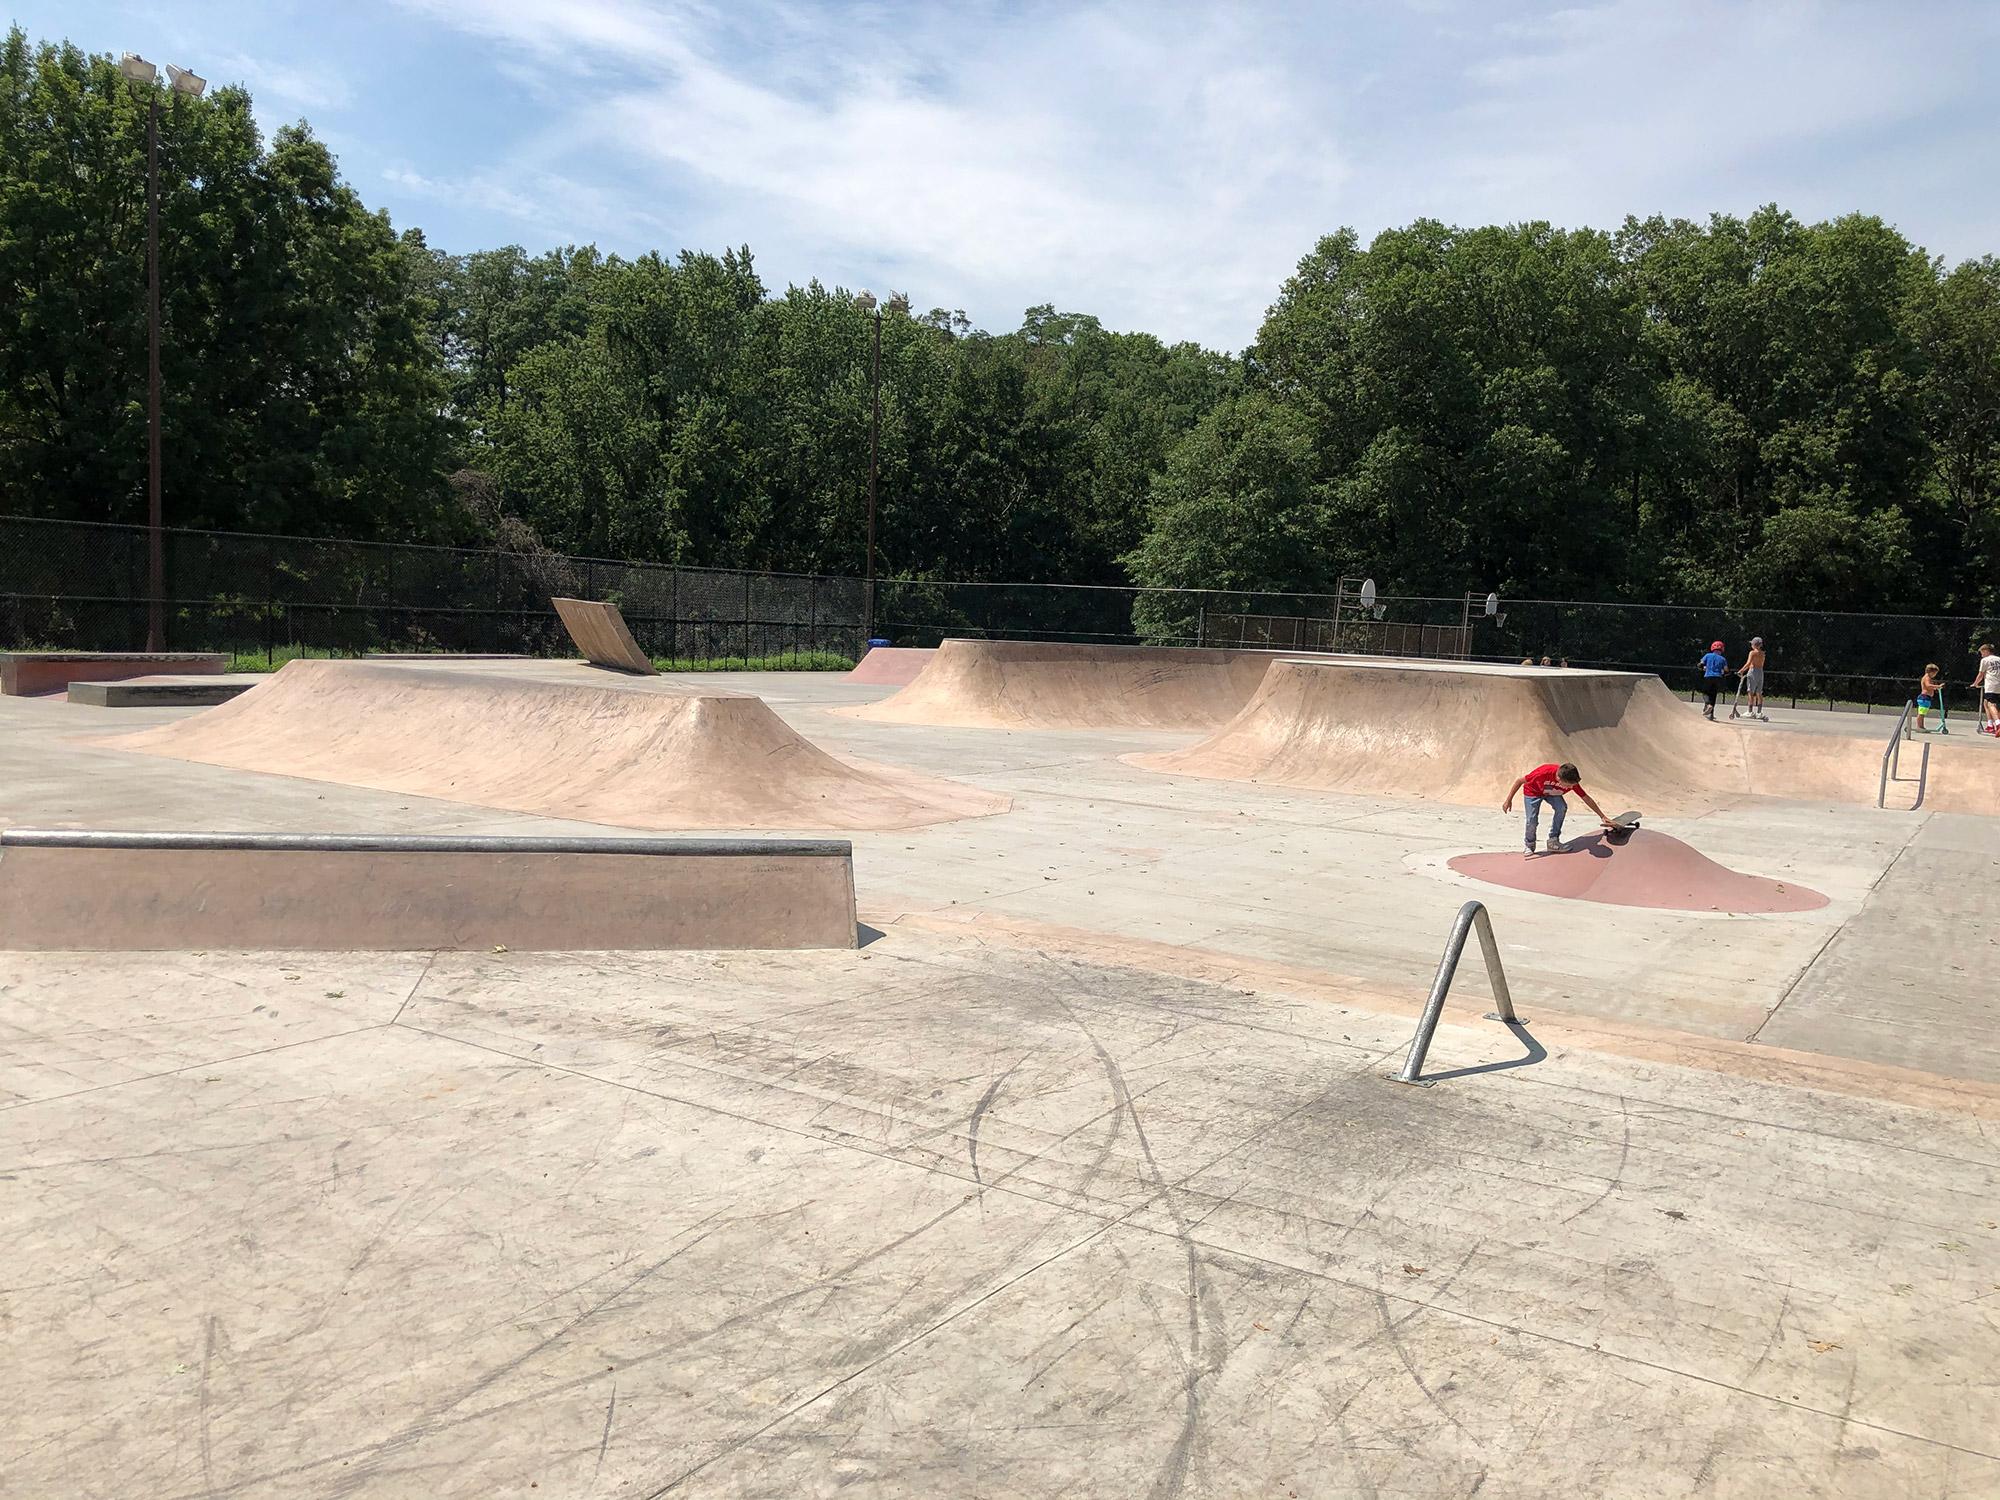 http://norcalmotorsports.org/users/bryan/Bikes/WoodbridgeSkatepark.jpg